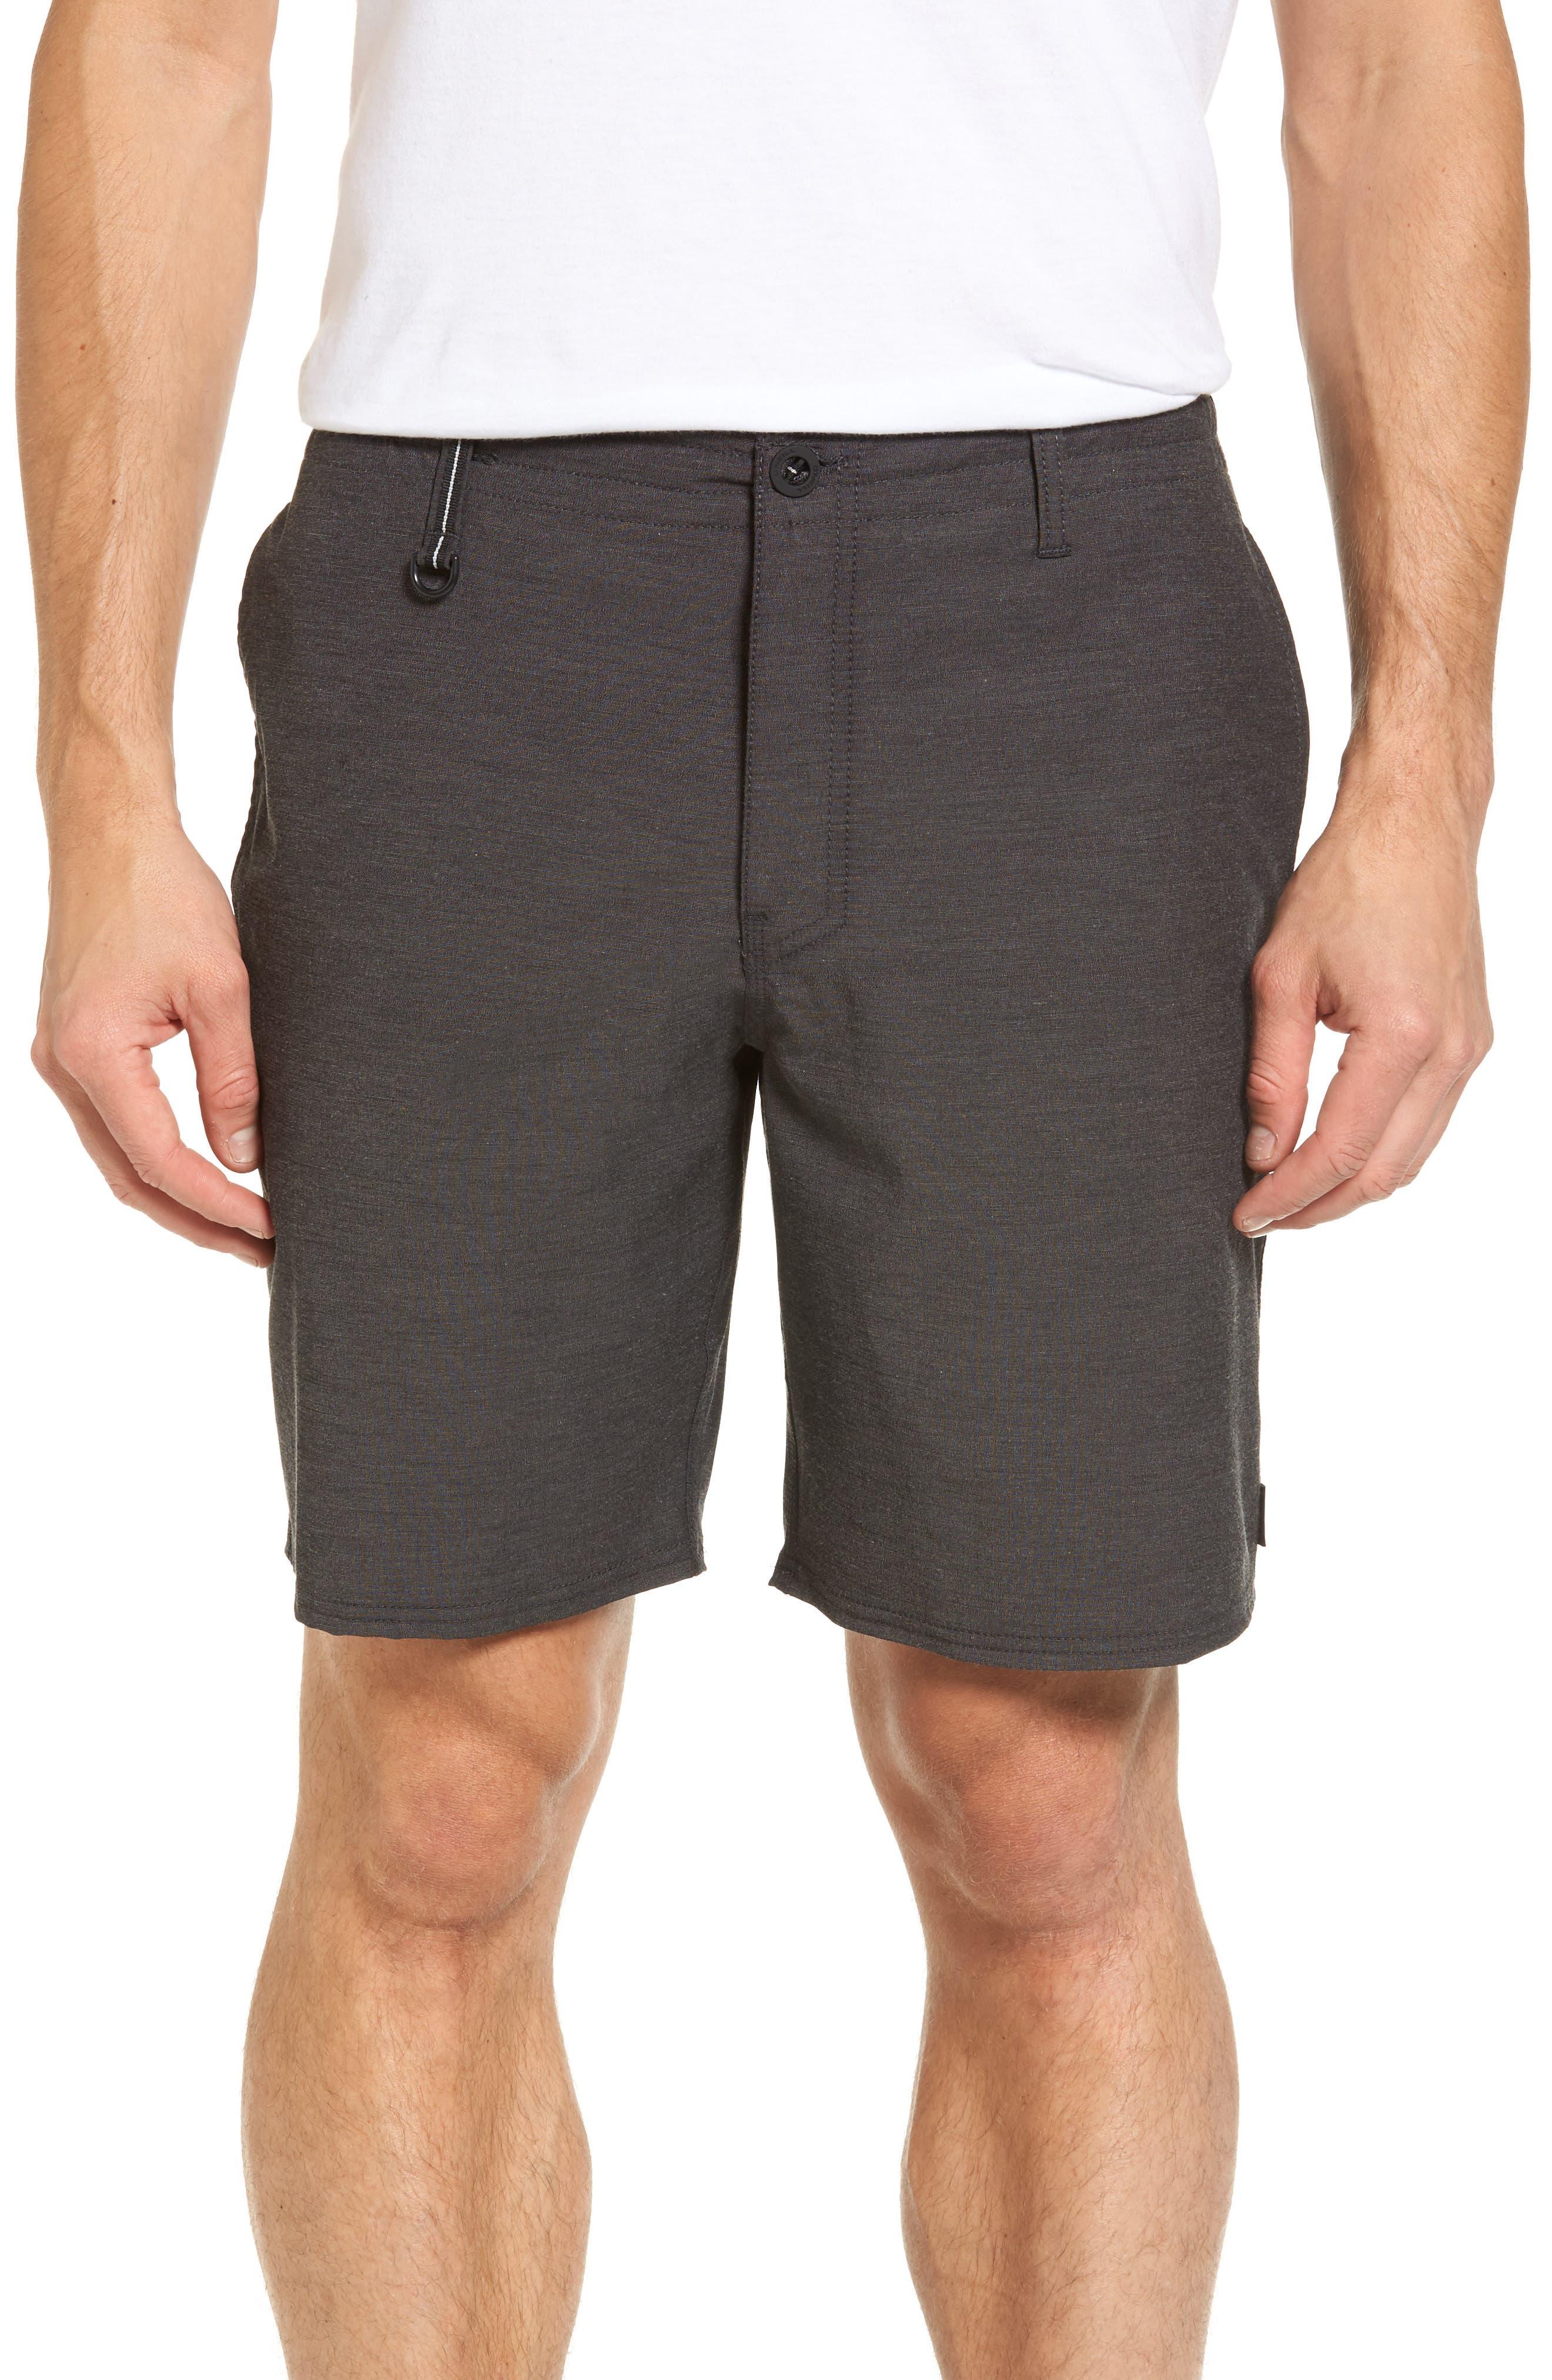 Traveler Recon Hybrid Shorts,                             Main thumbnail 1, color,                             001